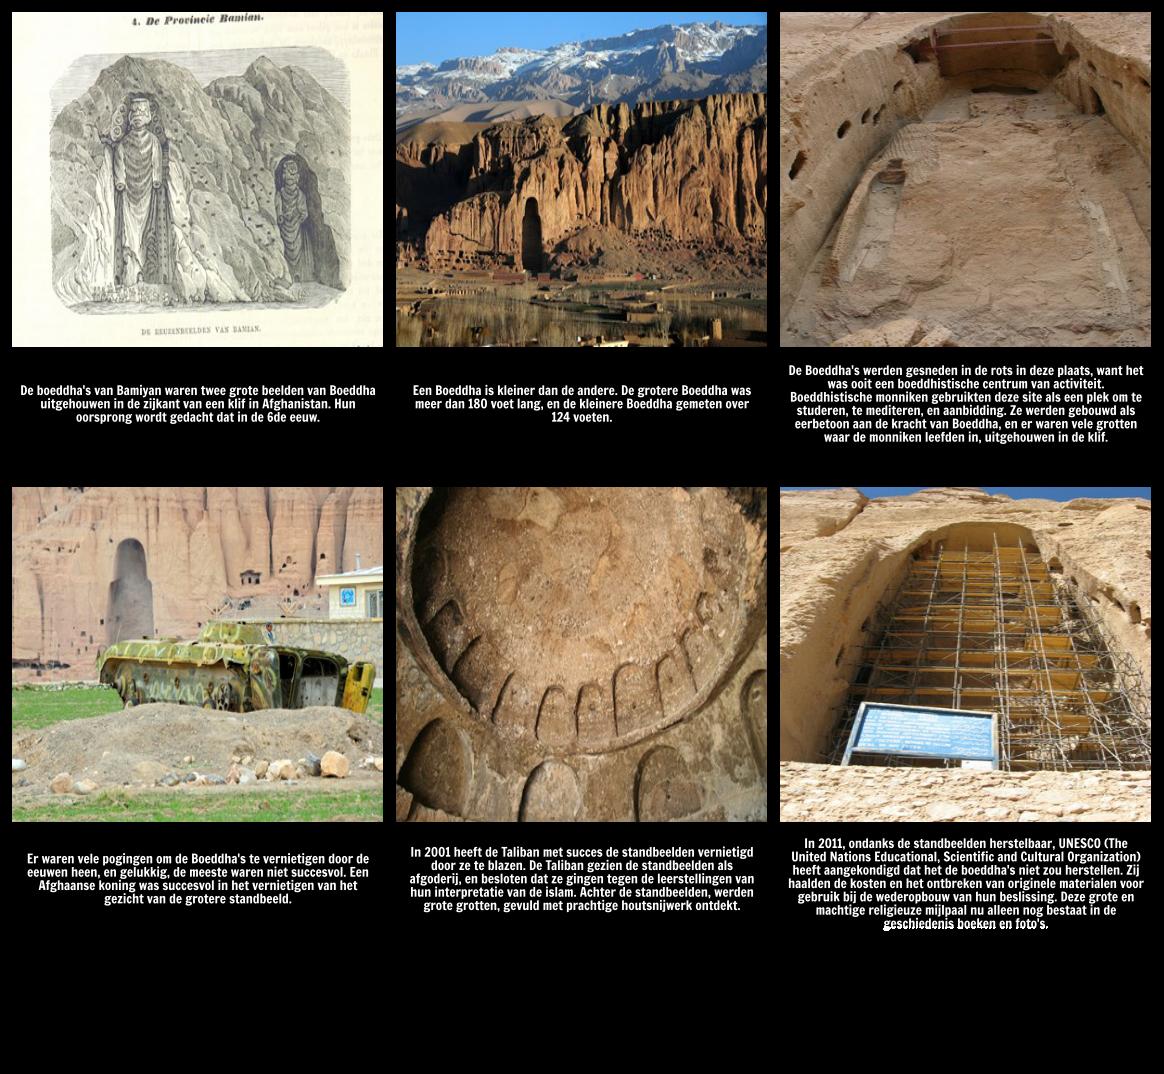 "Verbinding maken met het thema van ""Ozymandias"": De Bamiyan Buddhas"